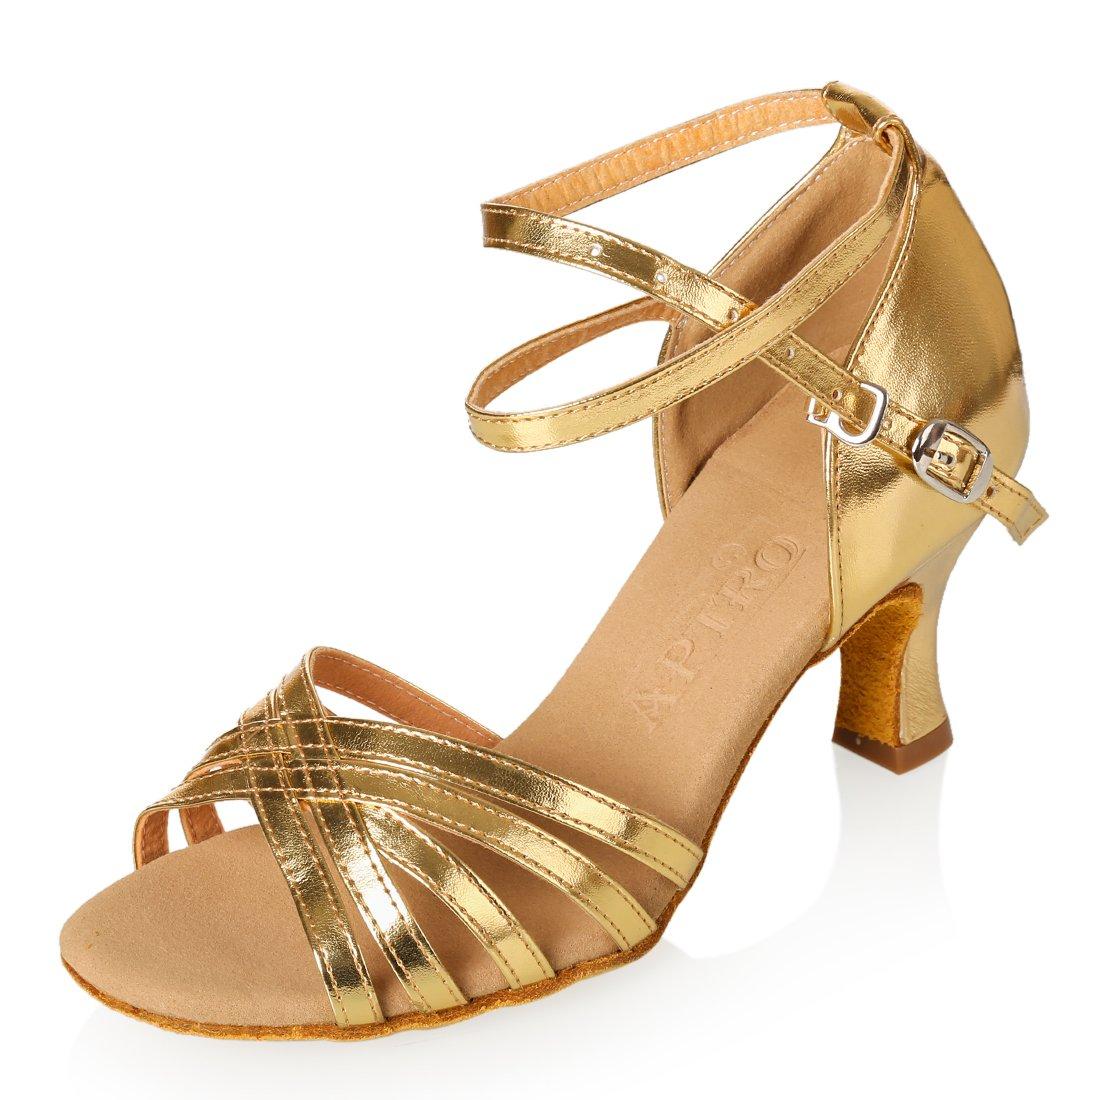 APTRO Damen Schuhe Tanzschuhe Ballsaal Latin Tanzen Silber Sandalen  38.5 EU|Golden